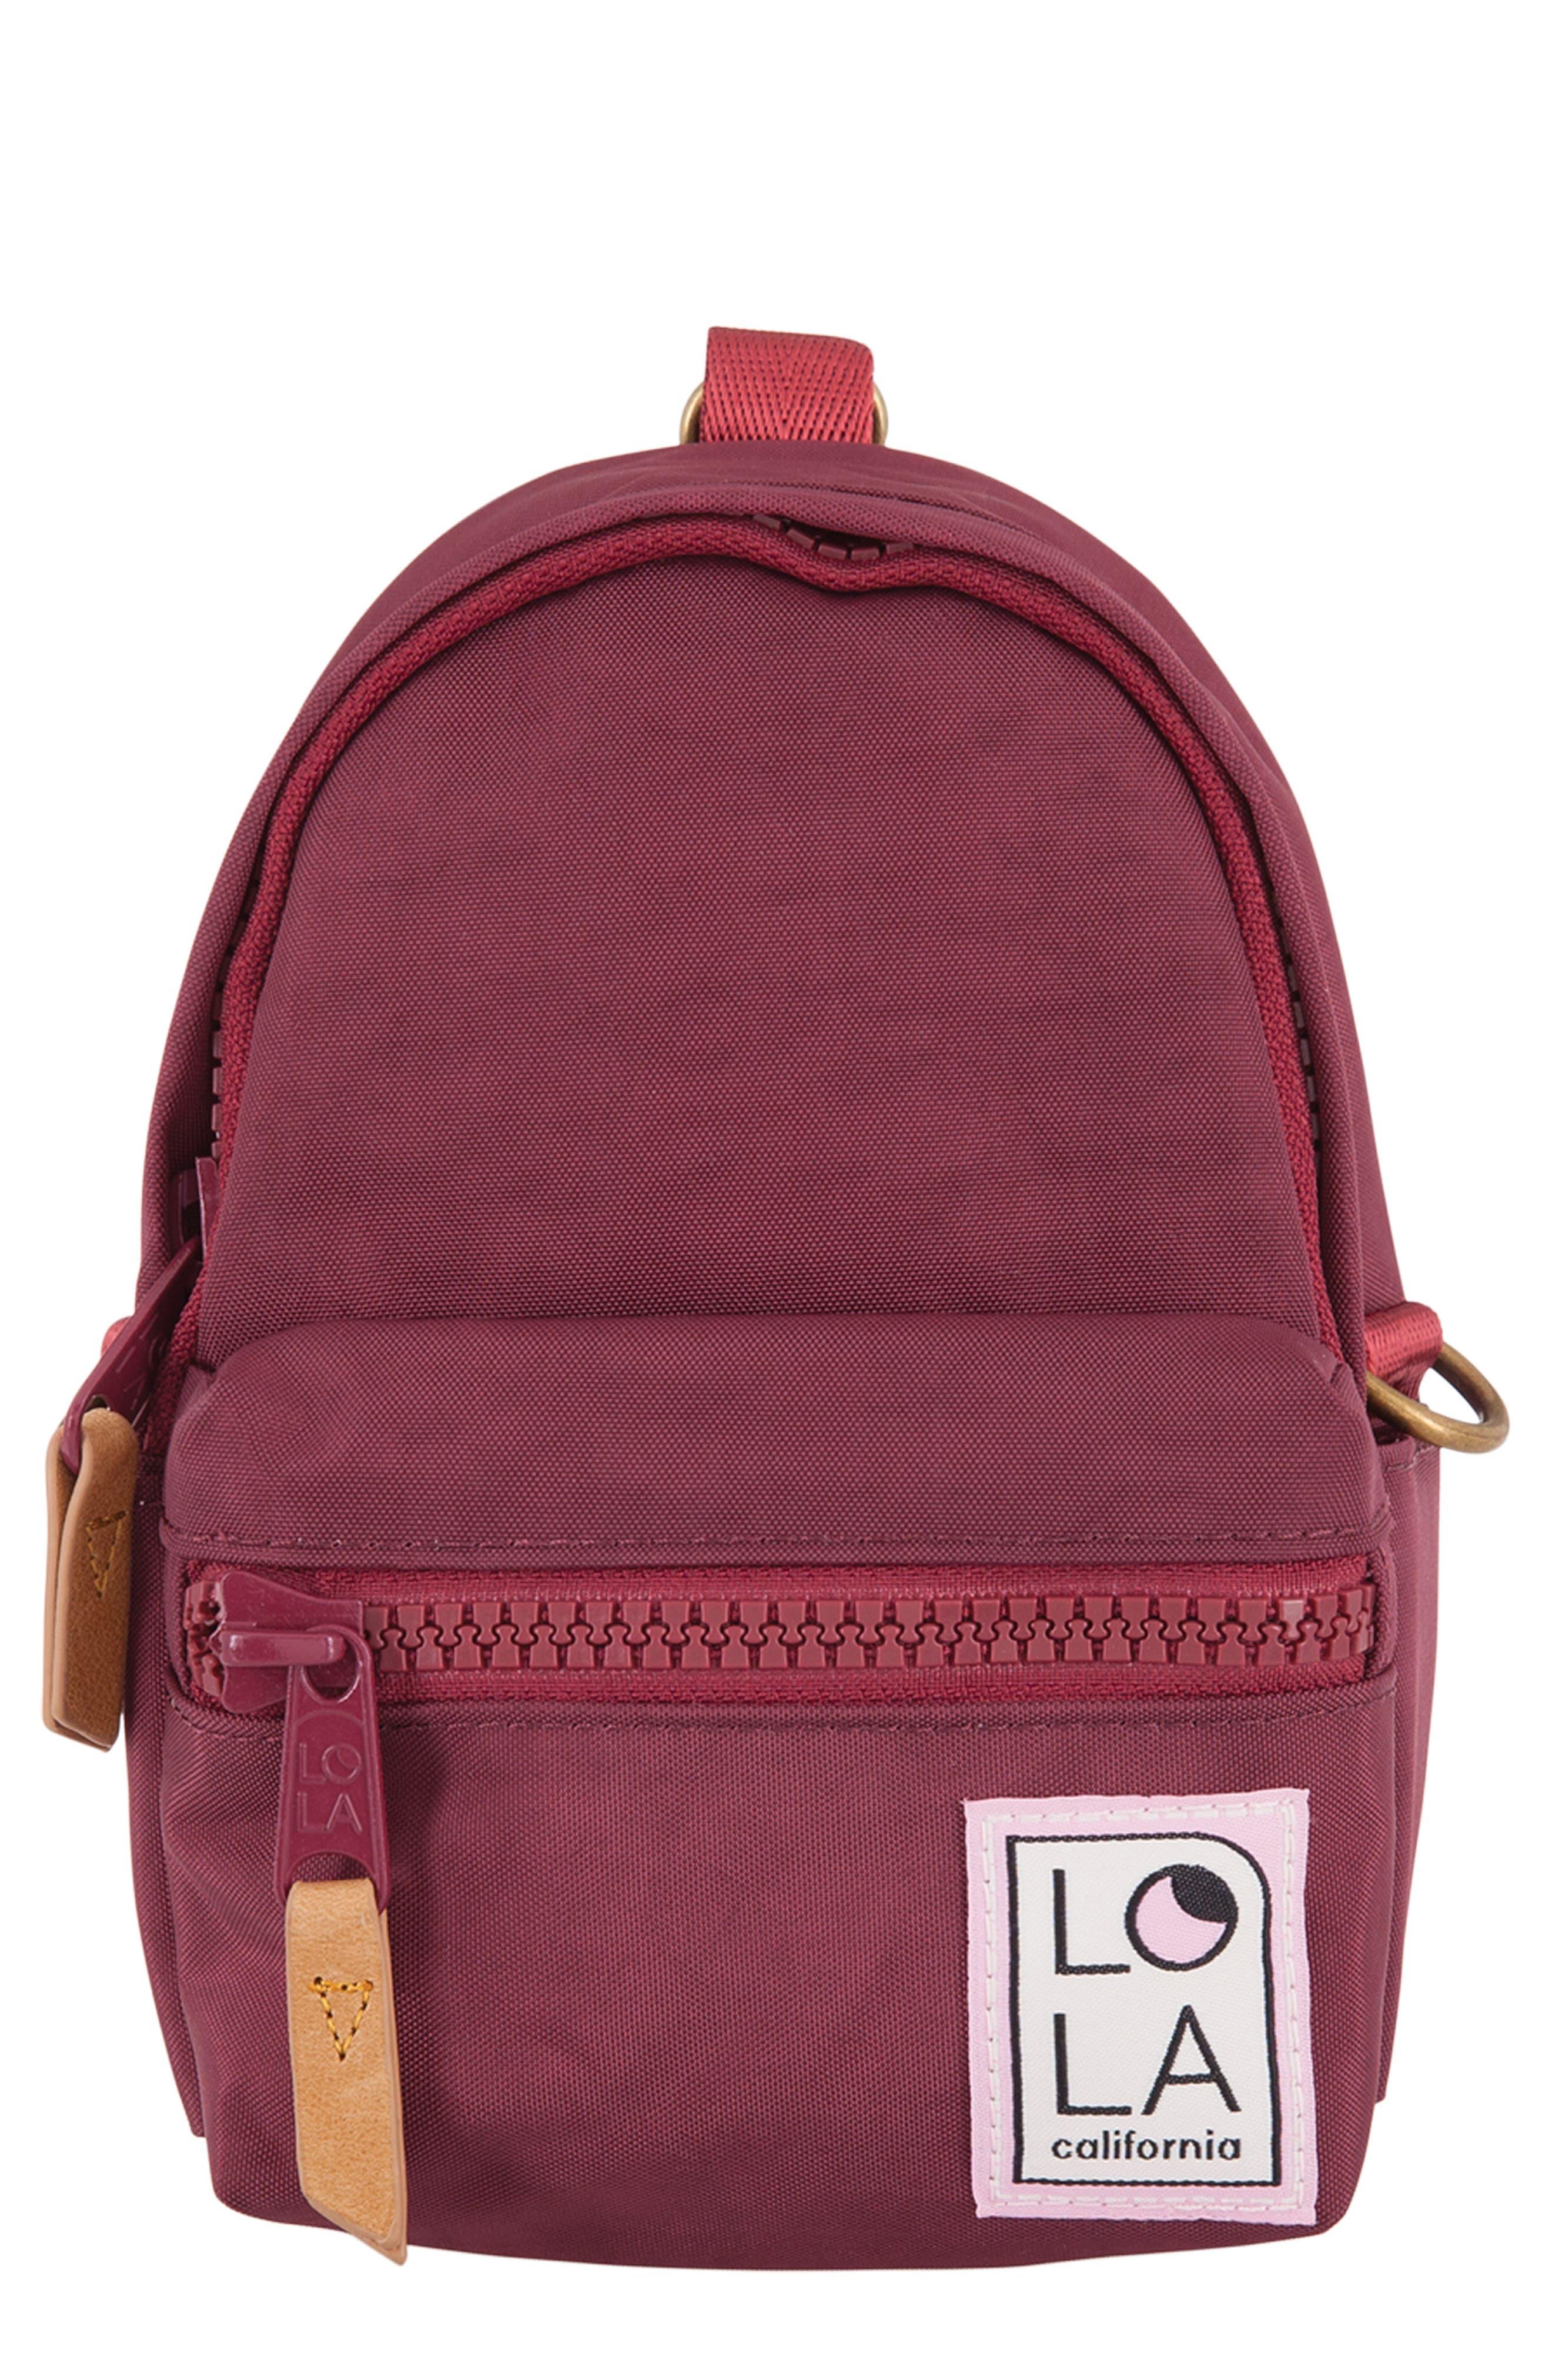 Lola Los Angeles Stargazer Mini Convertible Backpack - Burgundy